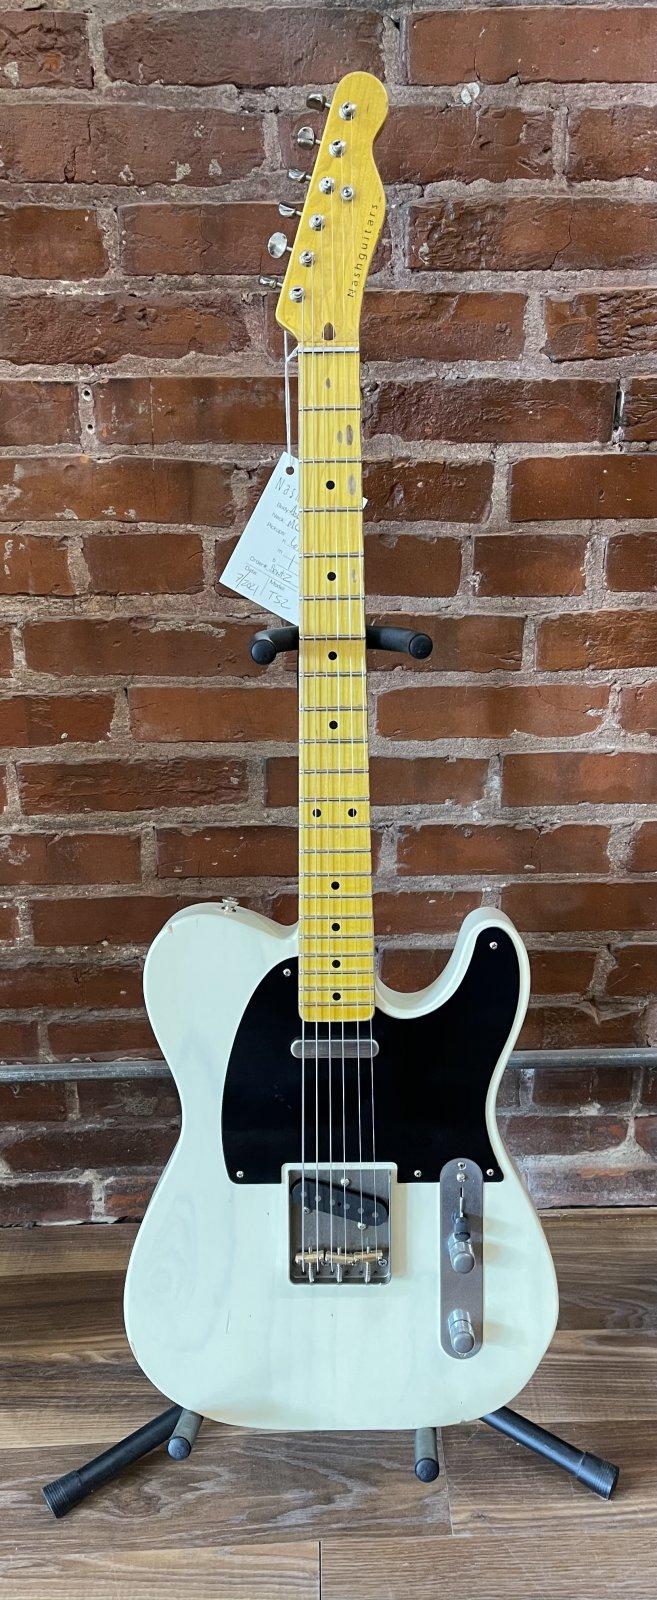 Nash Guitars T-52 Electric Guitar